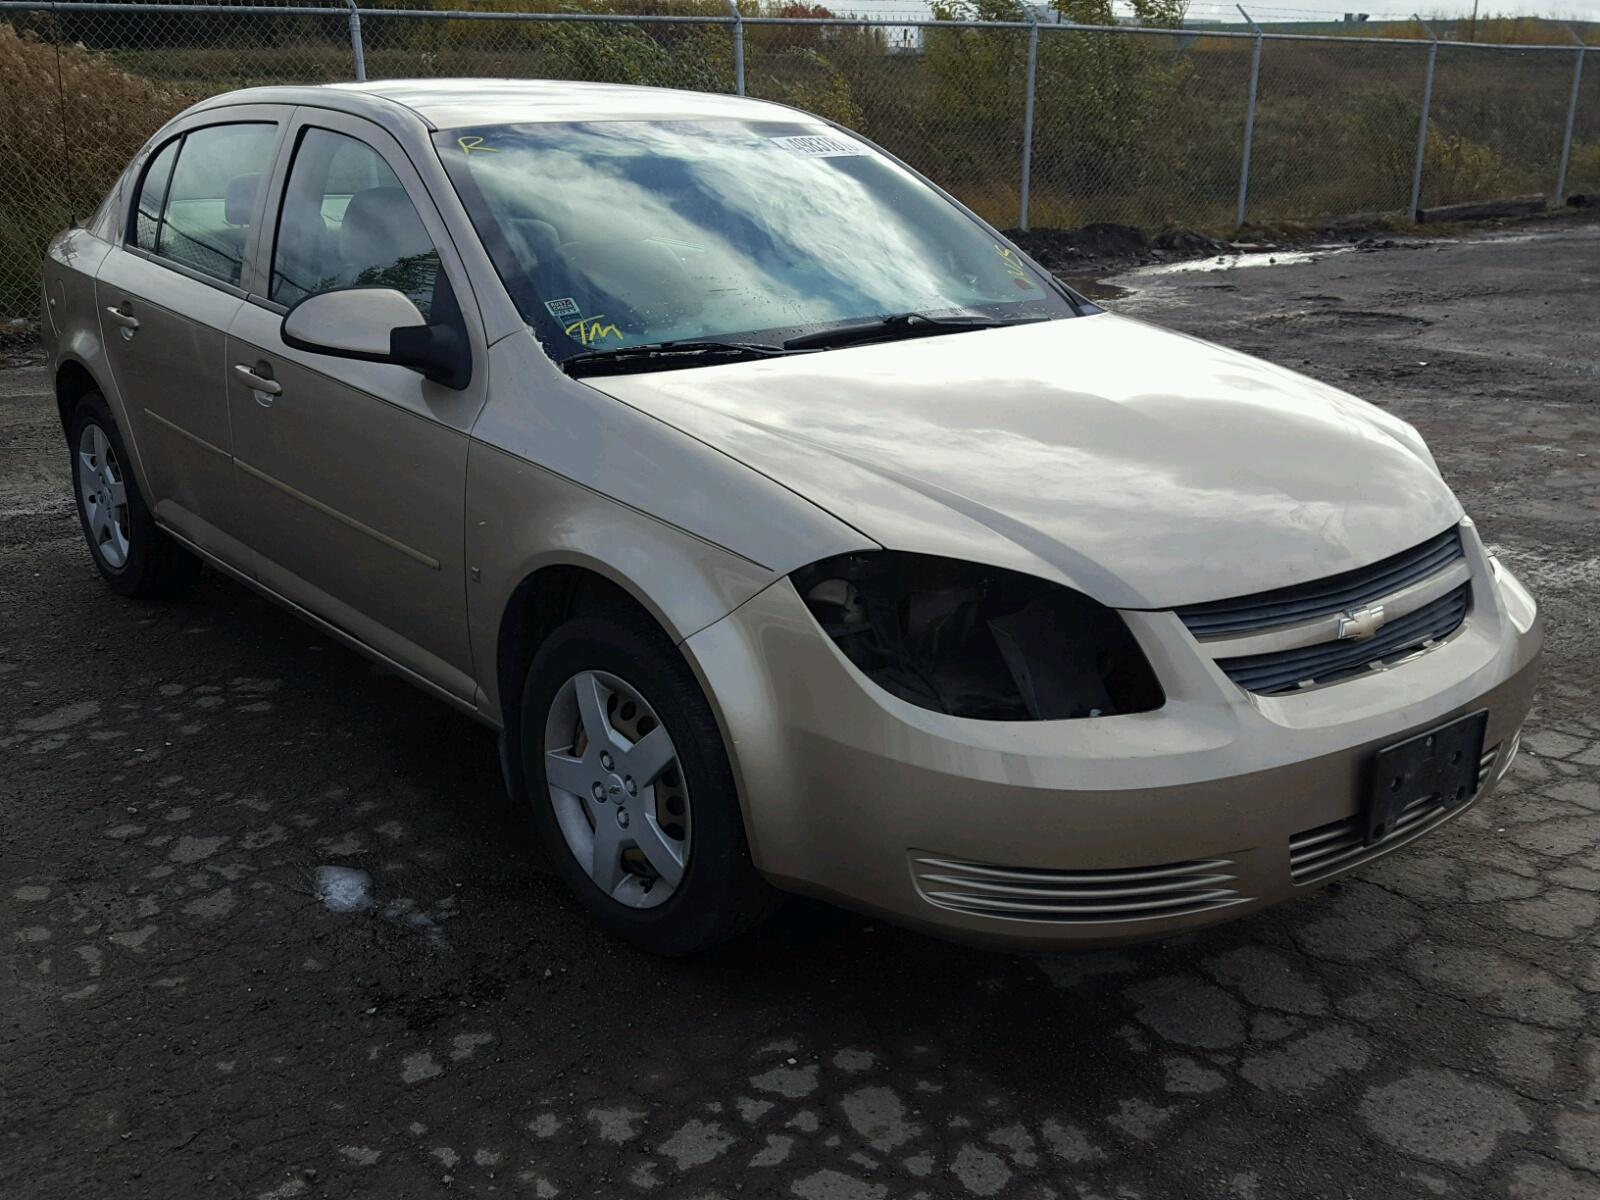 Salvage 2008 Chevrolet COBALT LT for sale